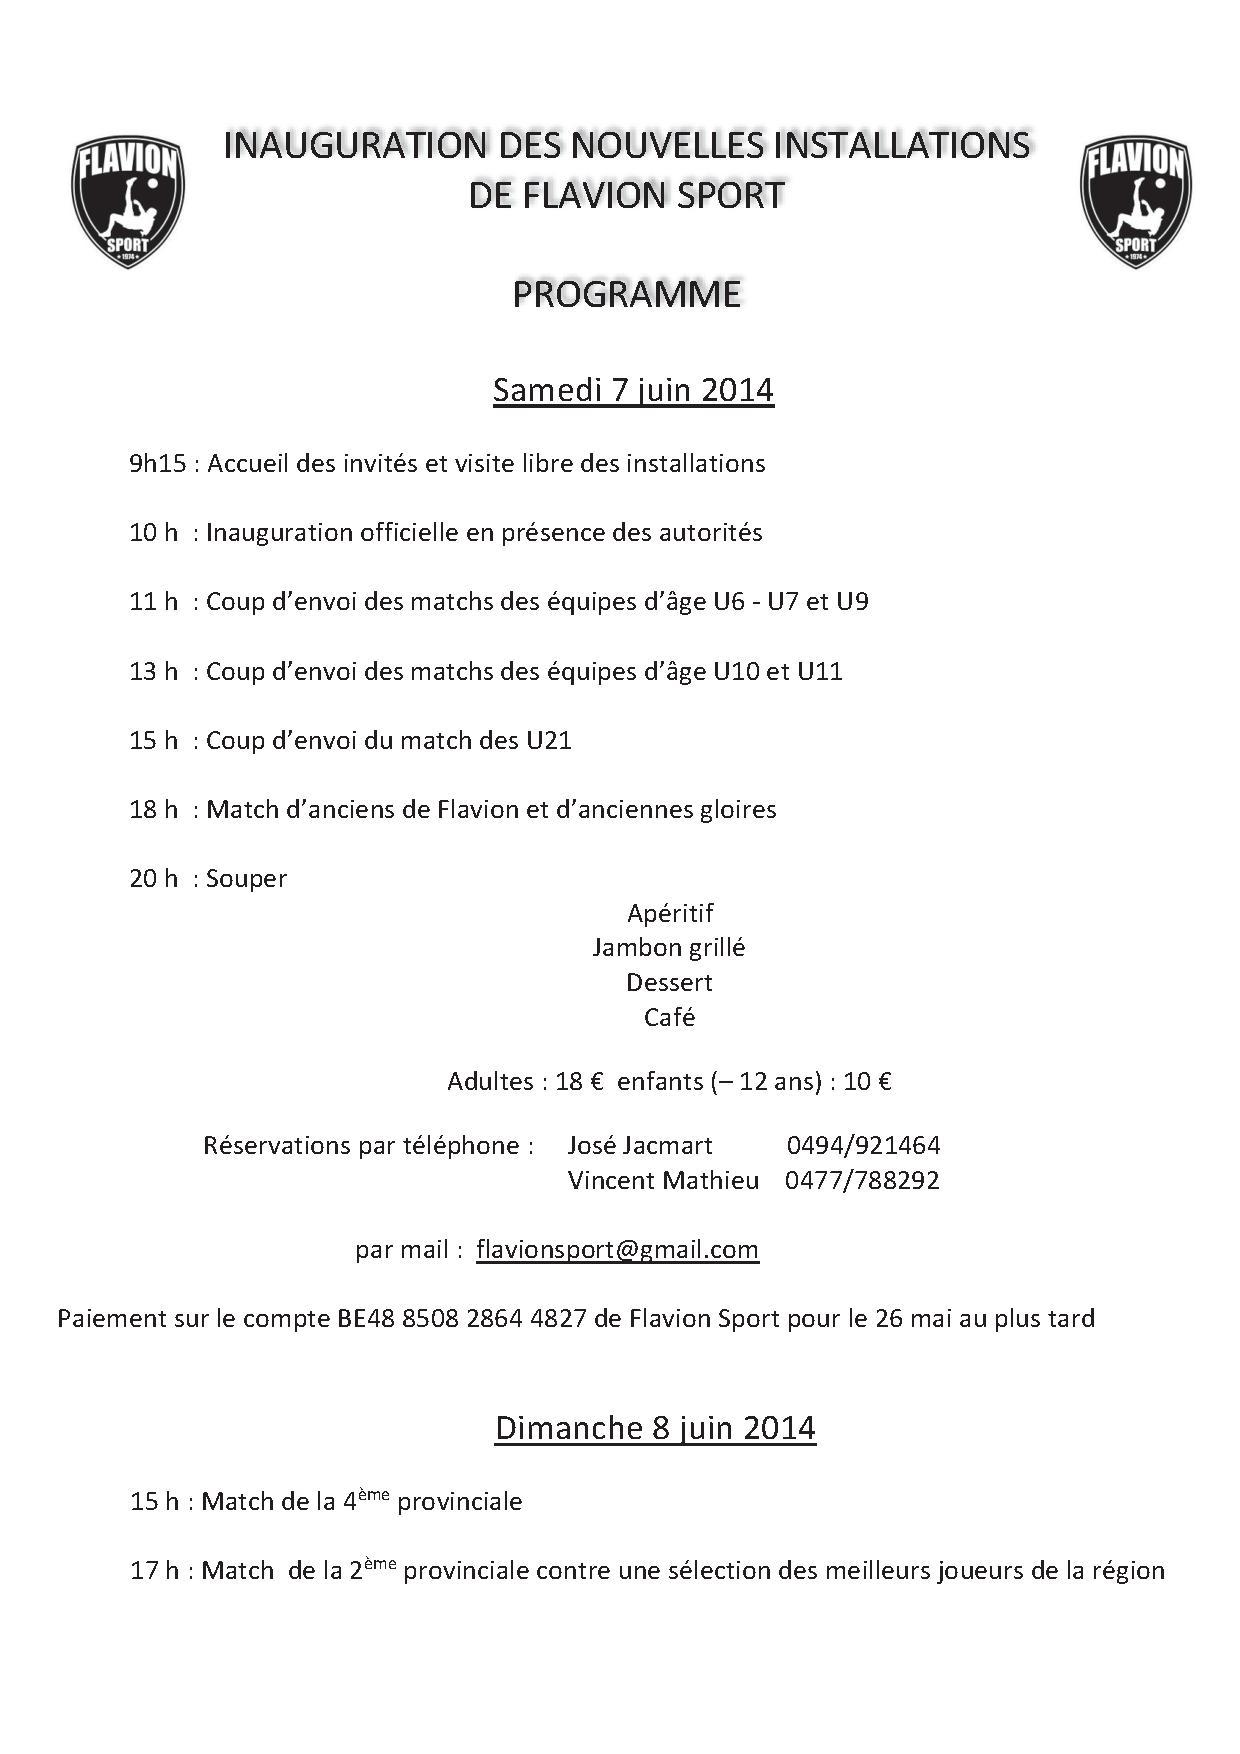 programme inauguration